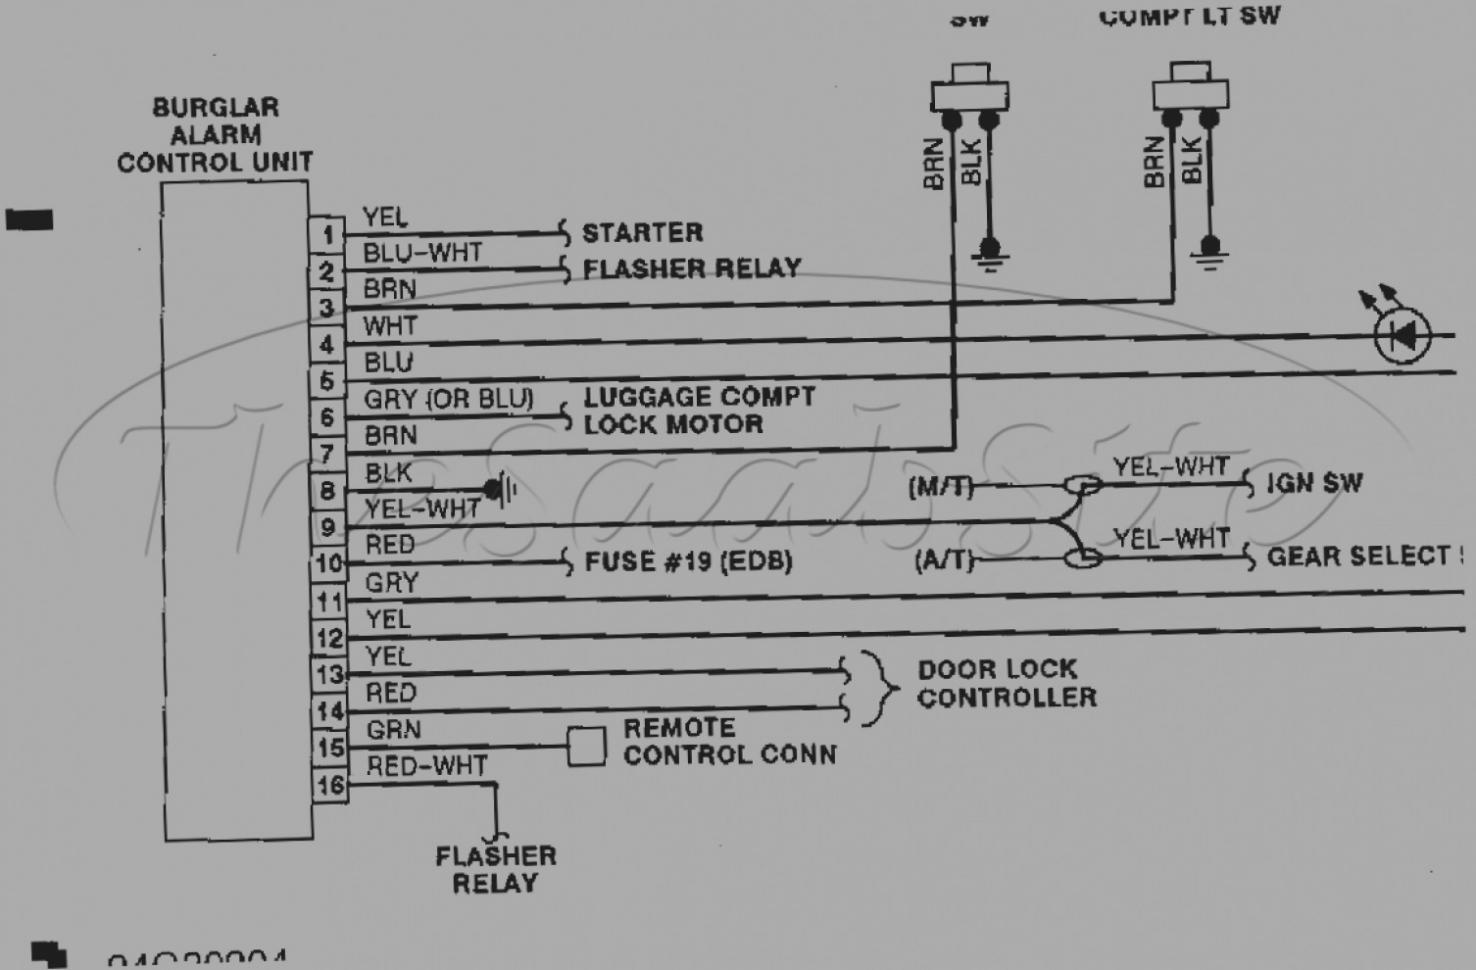 whelen epsilon wiring diagram Collection-Whelen Epsilon Wiring Diagram New Whelen Alpha Siren Wiring Diagram Tamahuproject Wiring Diagrams 10-p